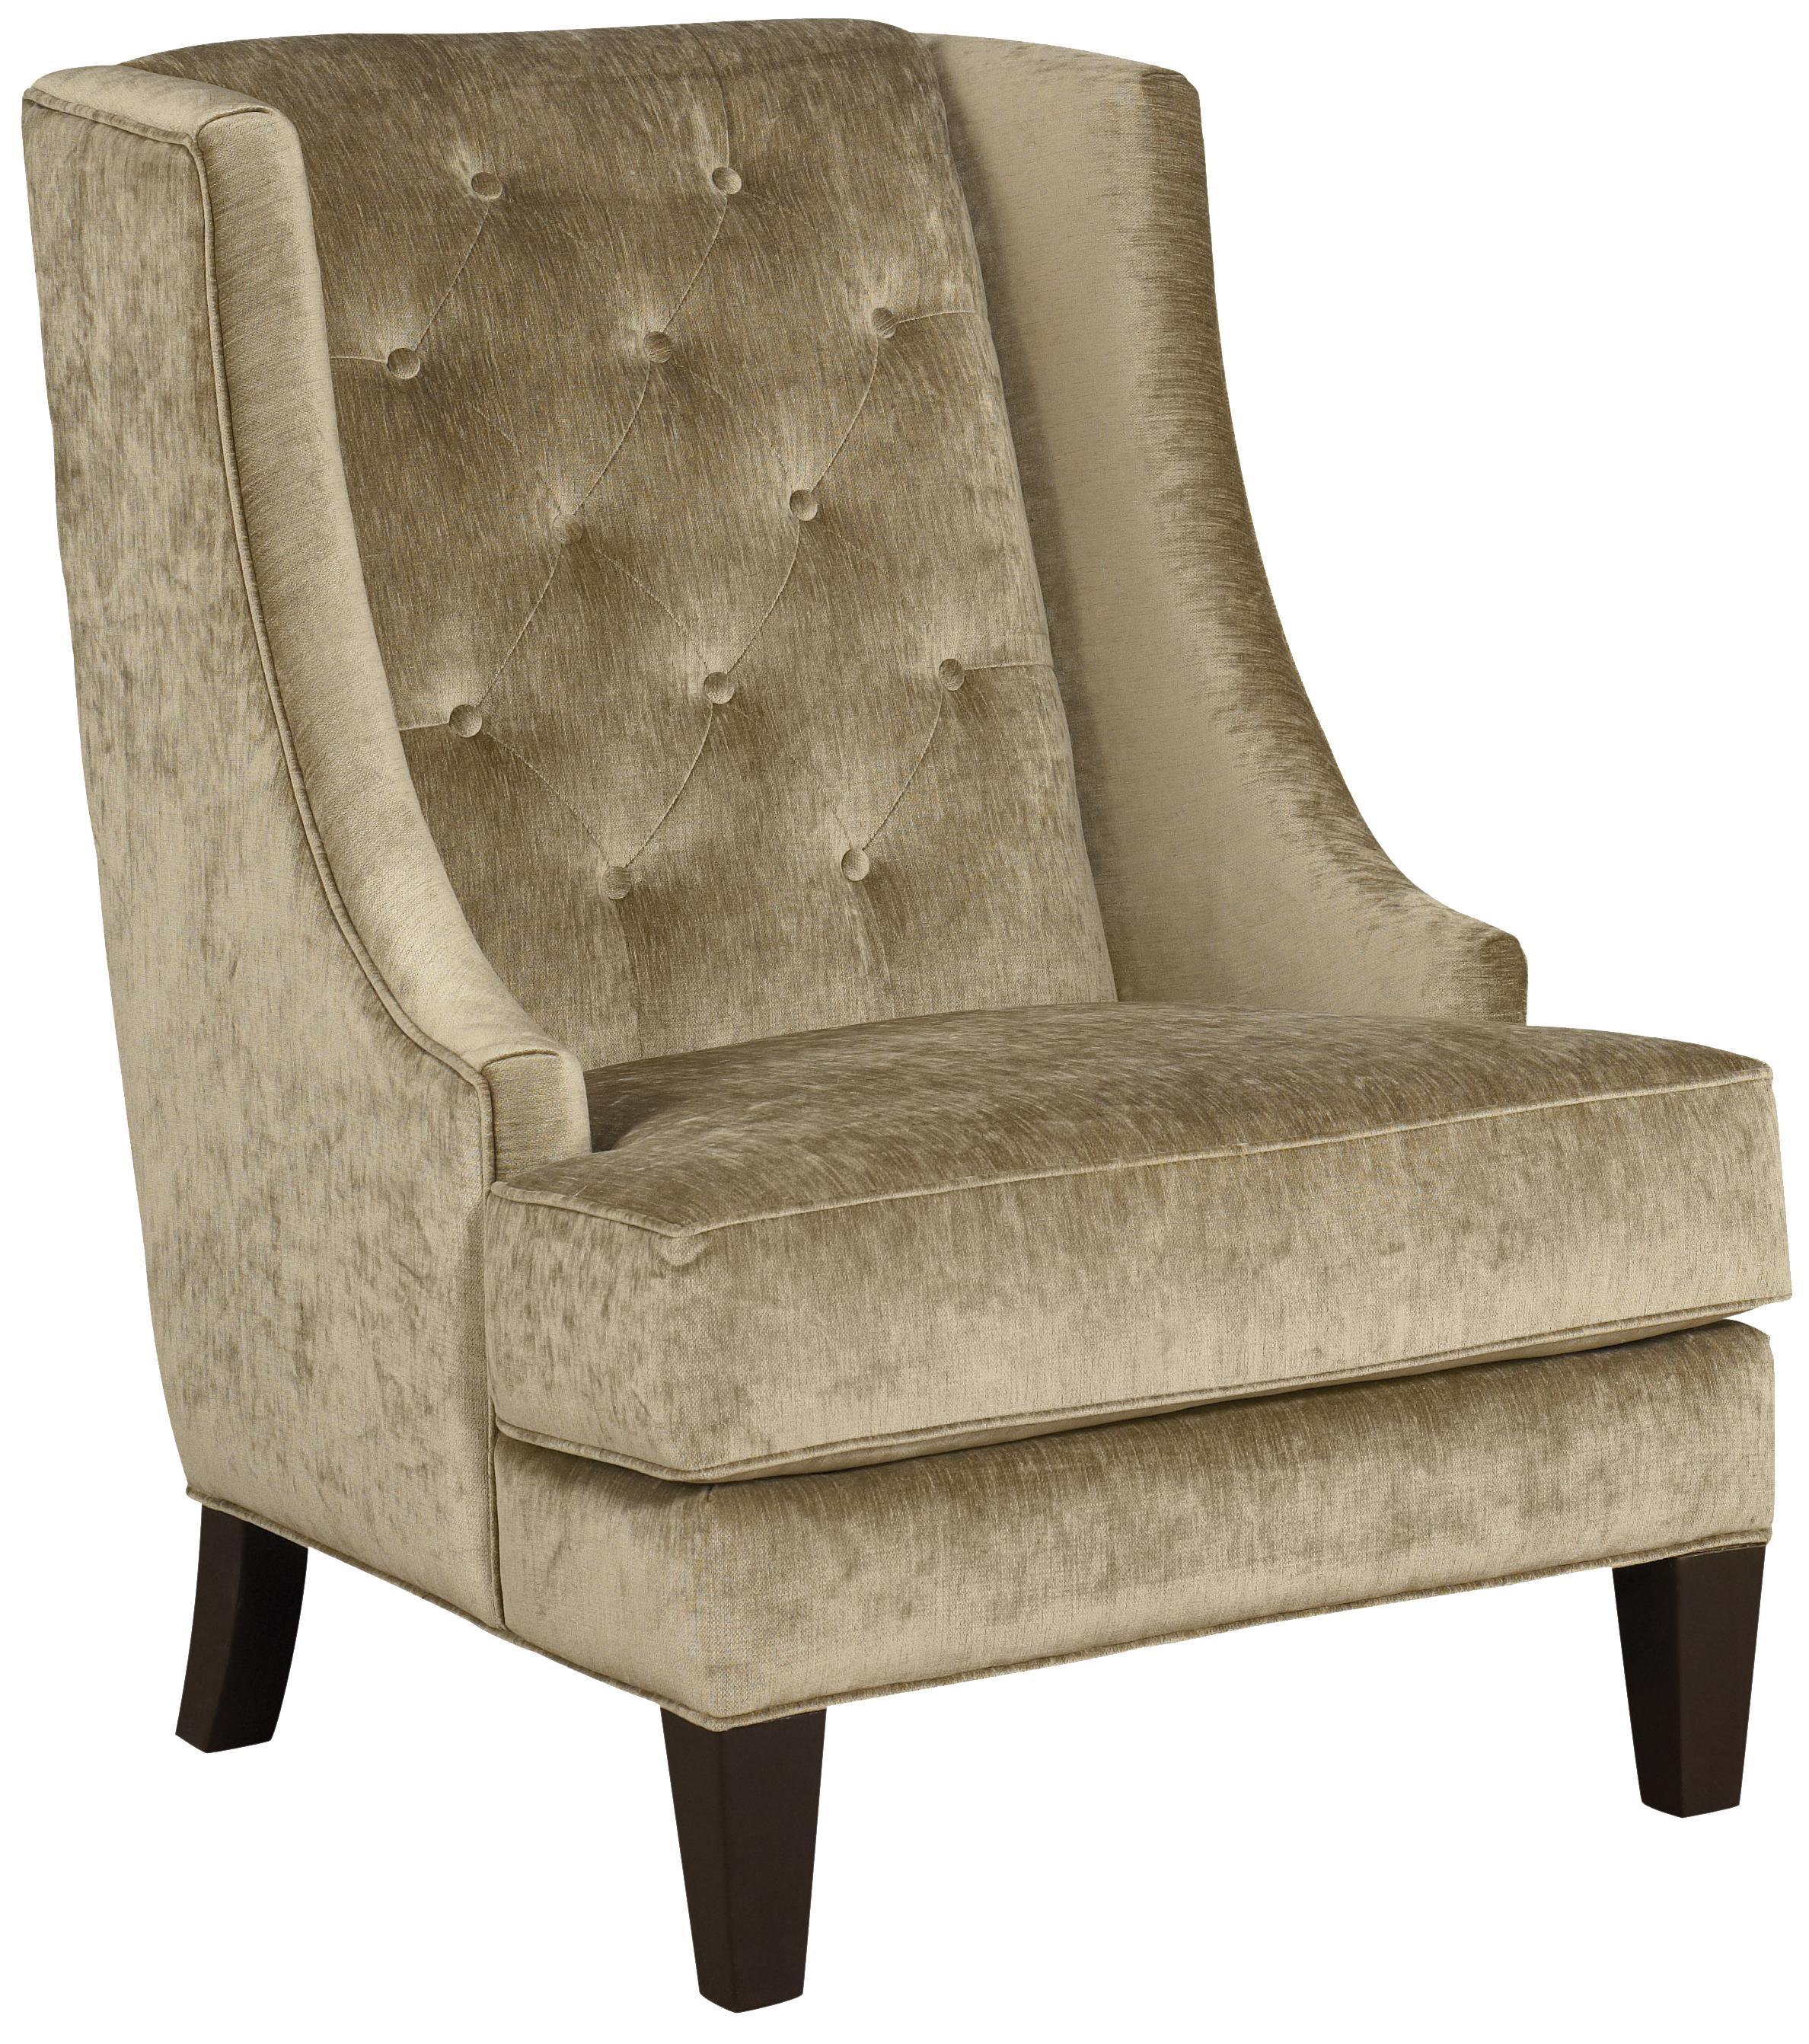 Jonathan Louis Accentuates Jillian Traditional Accent Chair